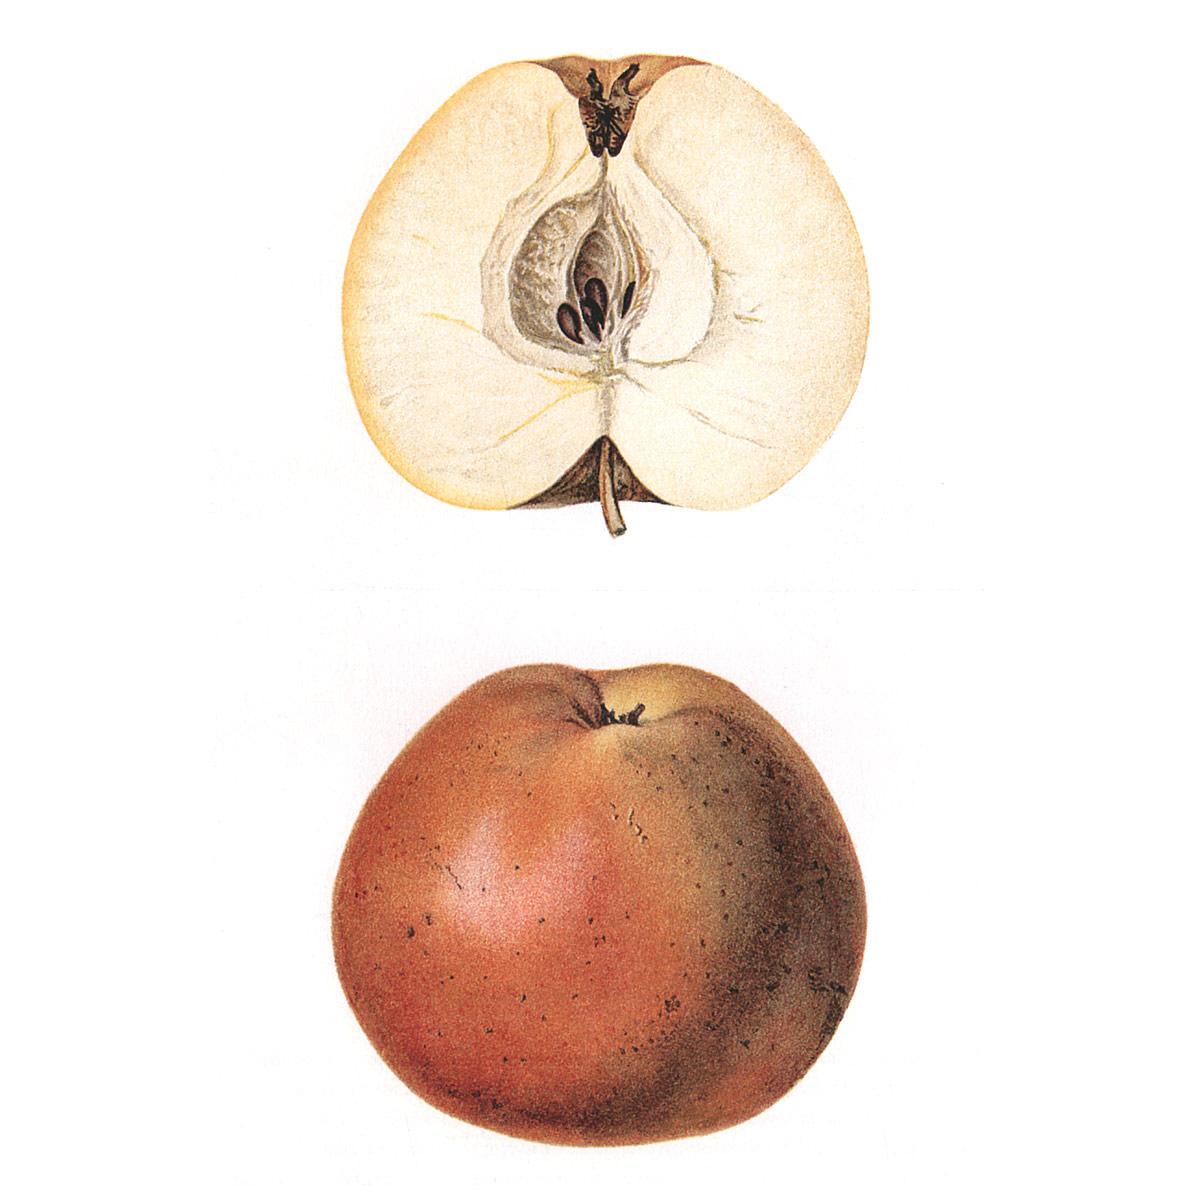 Атлас плодов